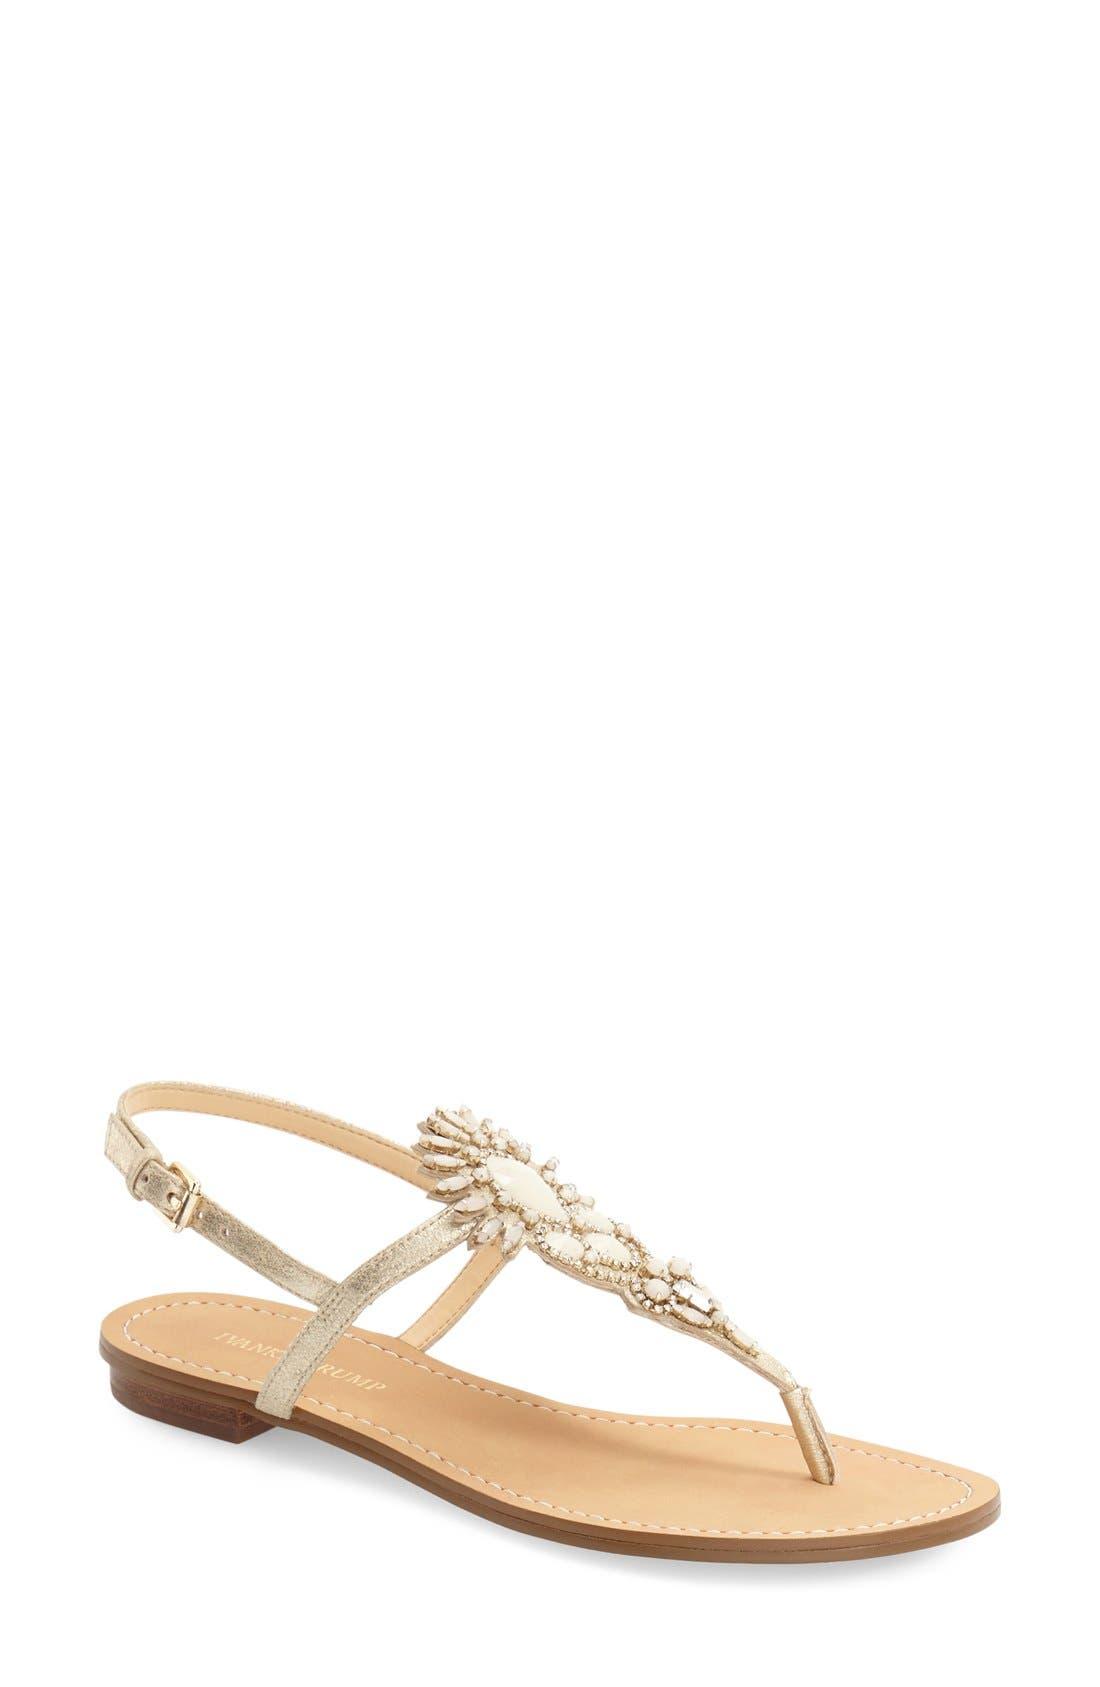 Alternate Image 1 Selected - Ivanka Trump 'Faron' Bead Embellished Flat Sandal (Women)